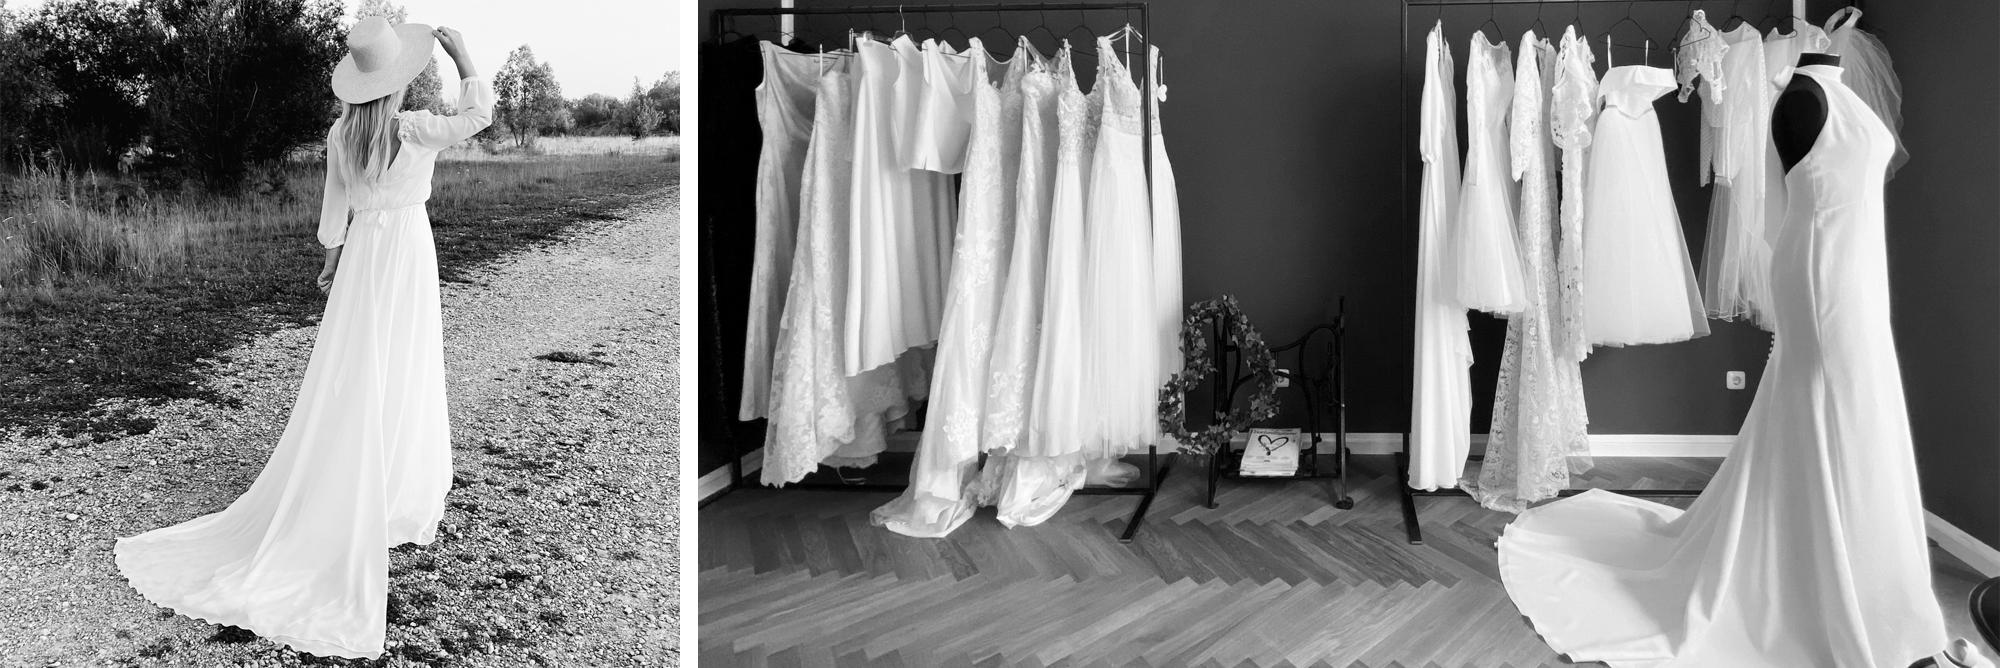 hugs & kisses – Second Hand Brautkleider